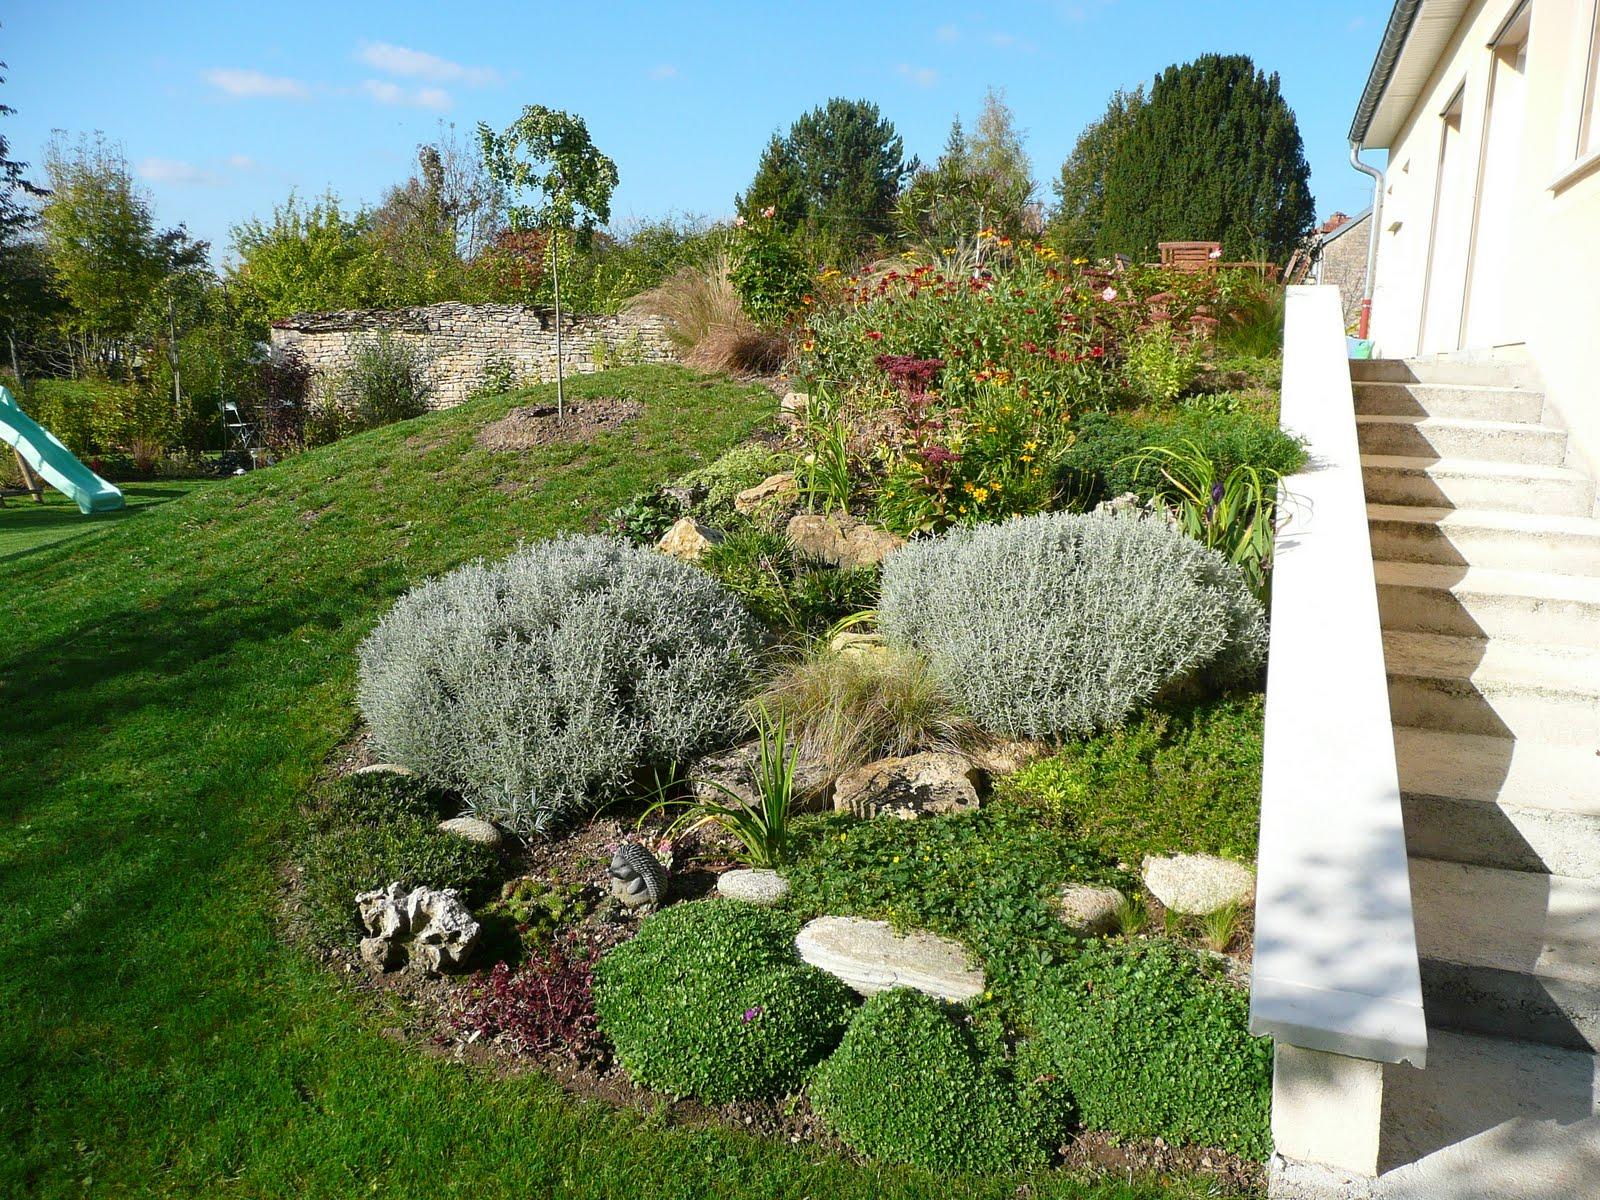 notre jardin secret agrandissement de la rocaille. Black Bedroom Furniture Sets. Home Design Ideas